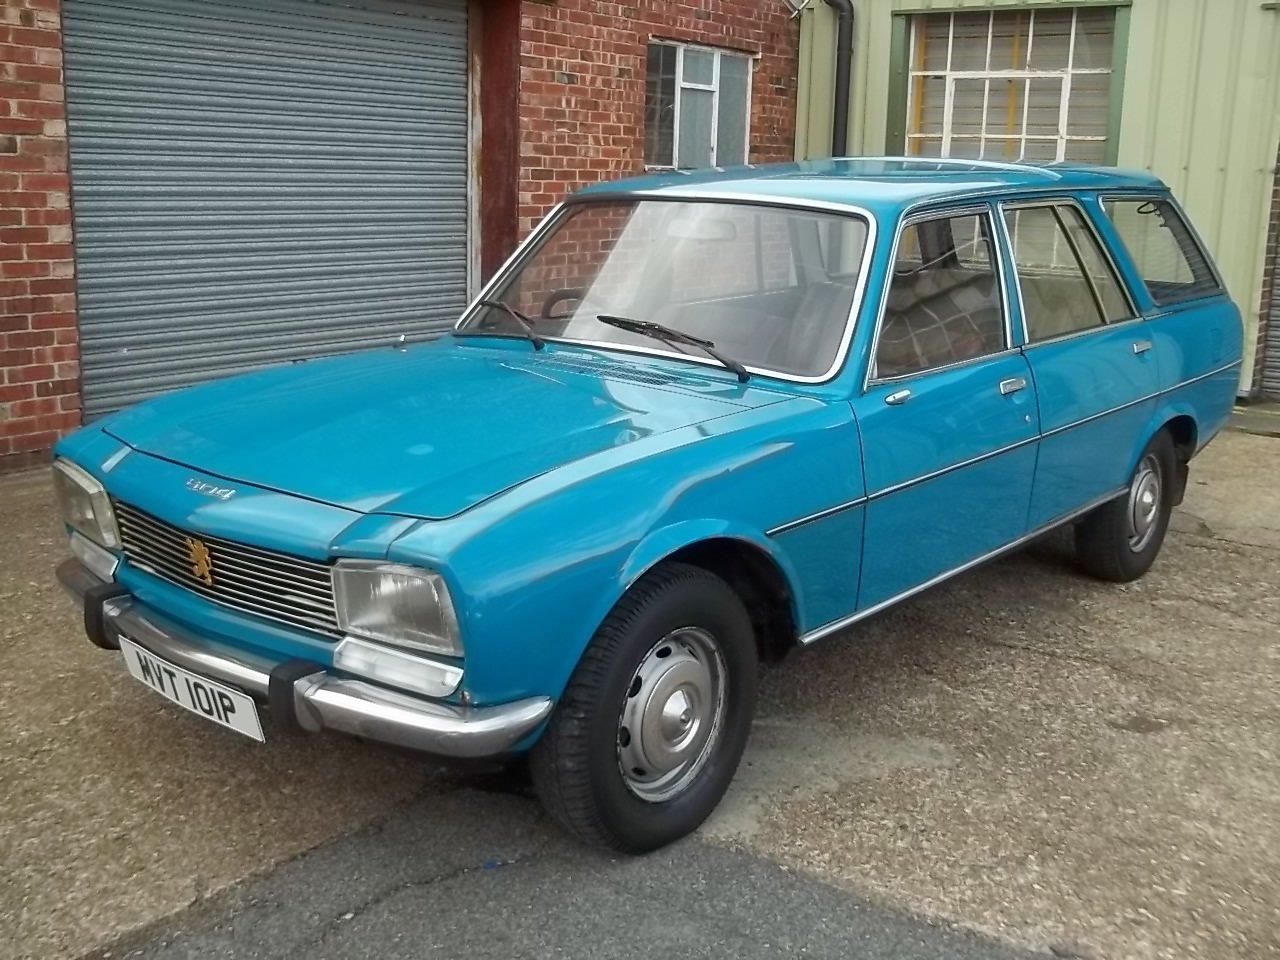 1976 Peugeot 504 2.0 Family Supplying Dealer + 1 owner SOLD (picture 3 of 6)